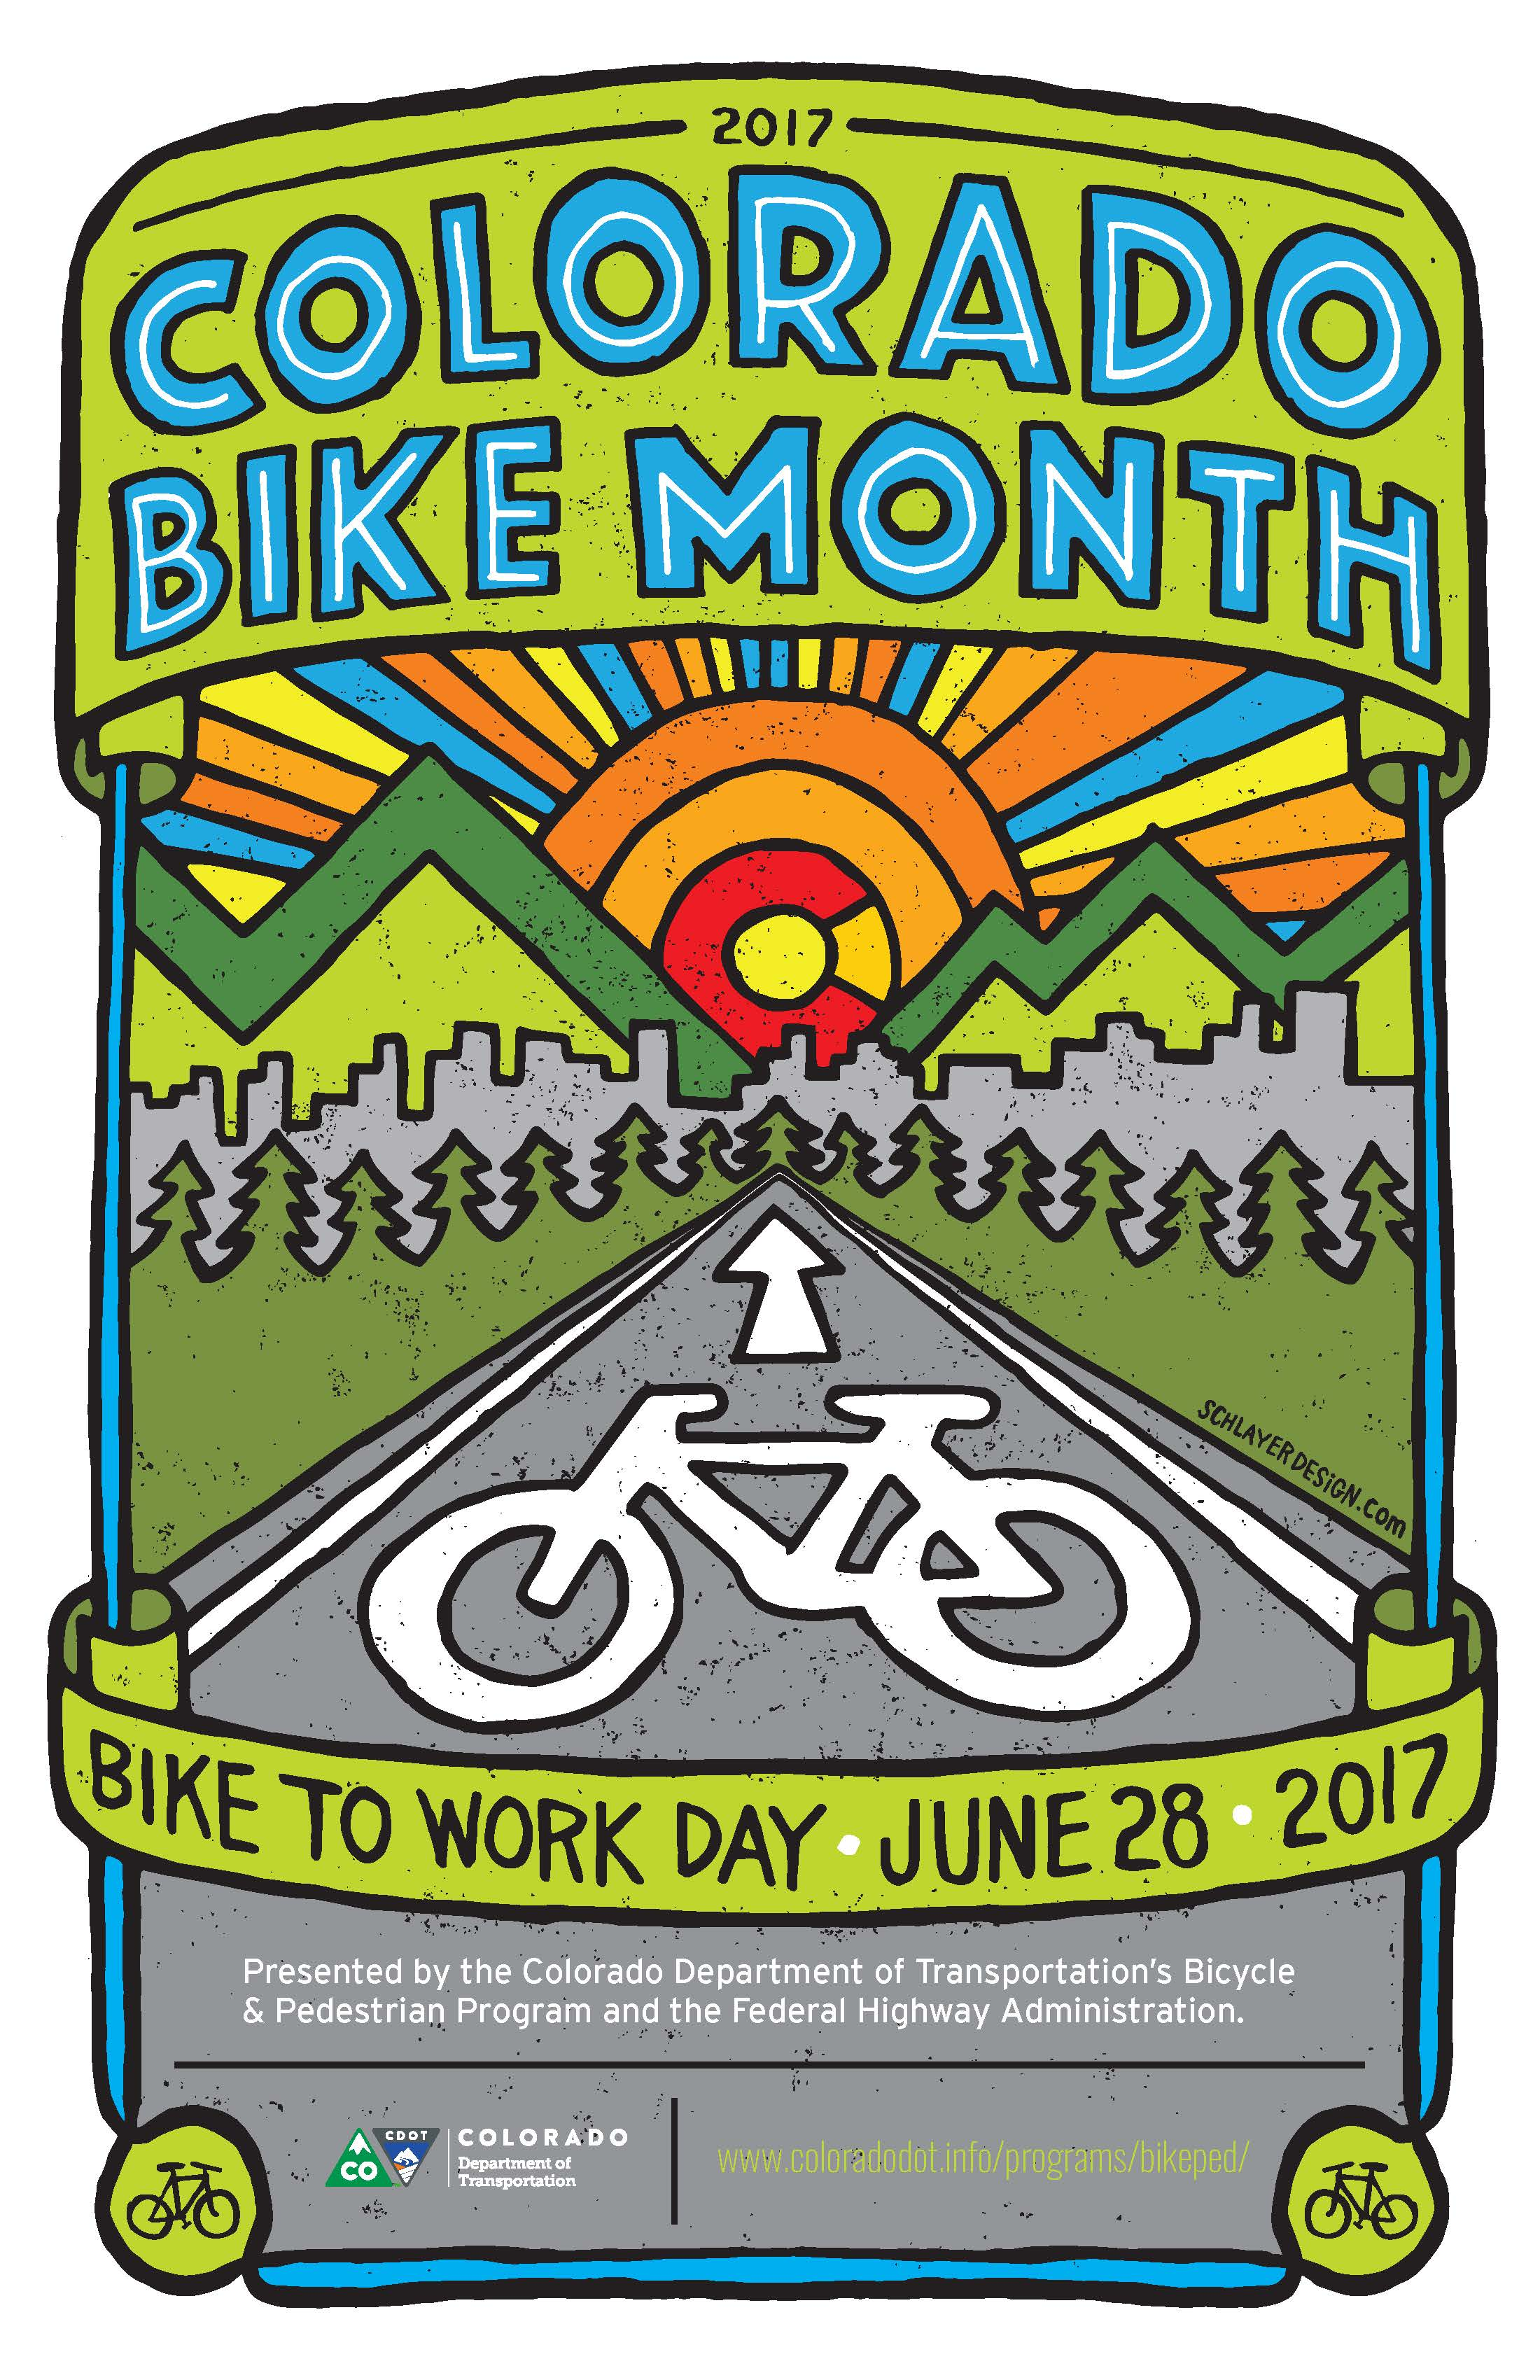 2017 Bike to Work Day Poster detail image